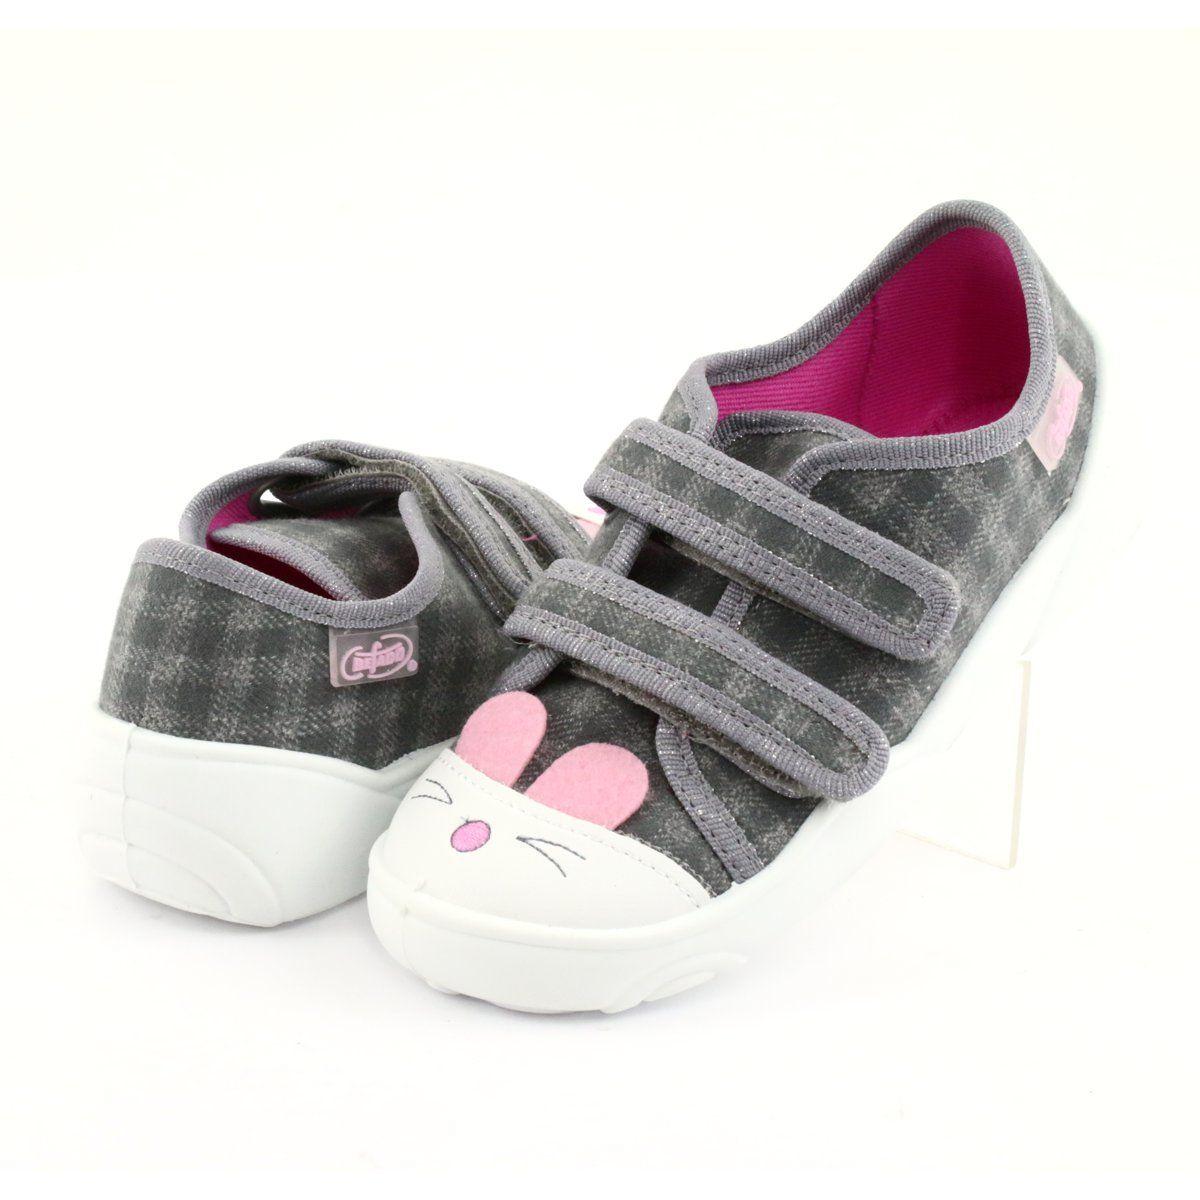 Befado Children S Shoes 907p108 Pink Grey Childrens Slippers Slippers For Girls Childrens Shoes